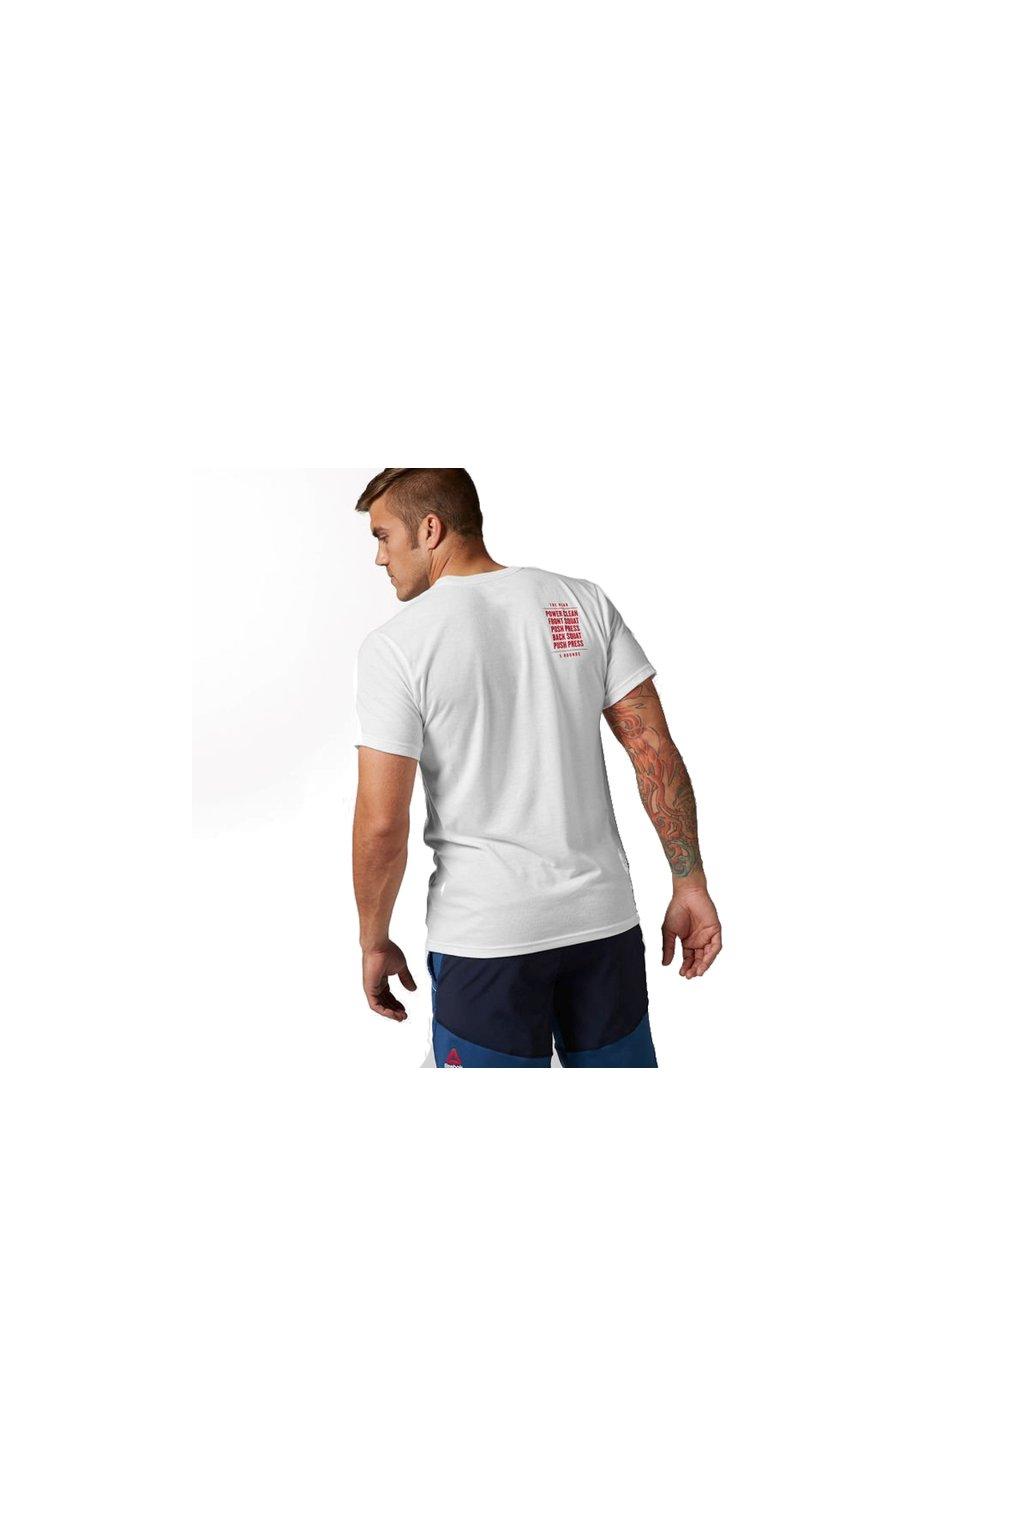 073694bbe7958 eng pm T Shirt Reebok CrossFit Bear Tee B83985 38229 2 REEBOK CROSSFIT  pánske tričko ...